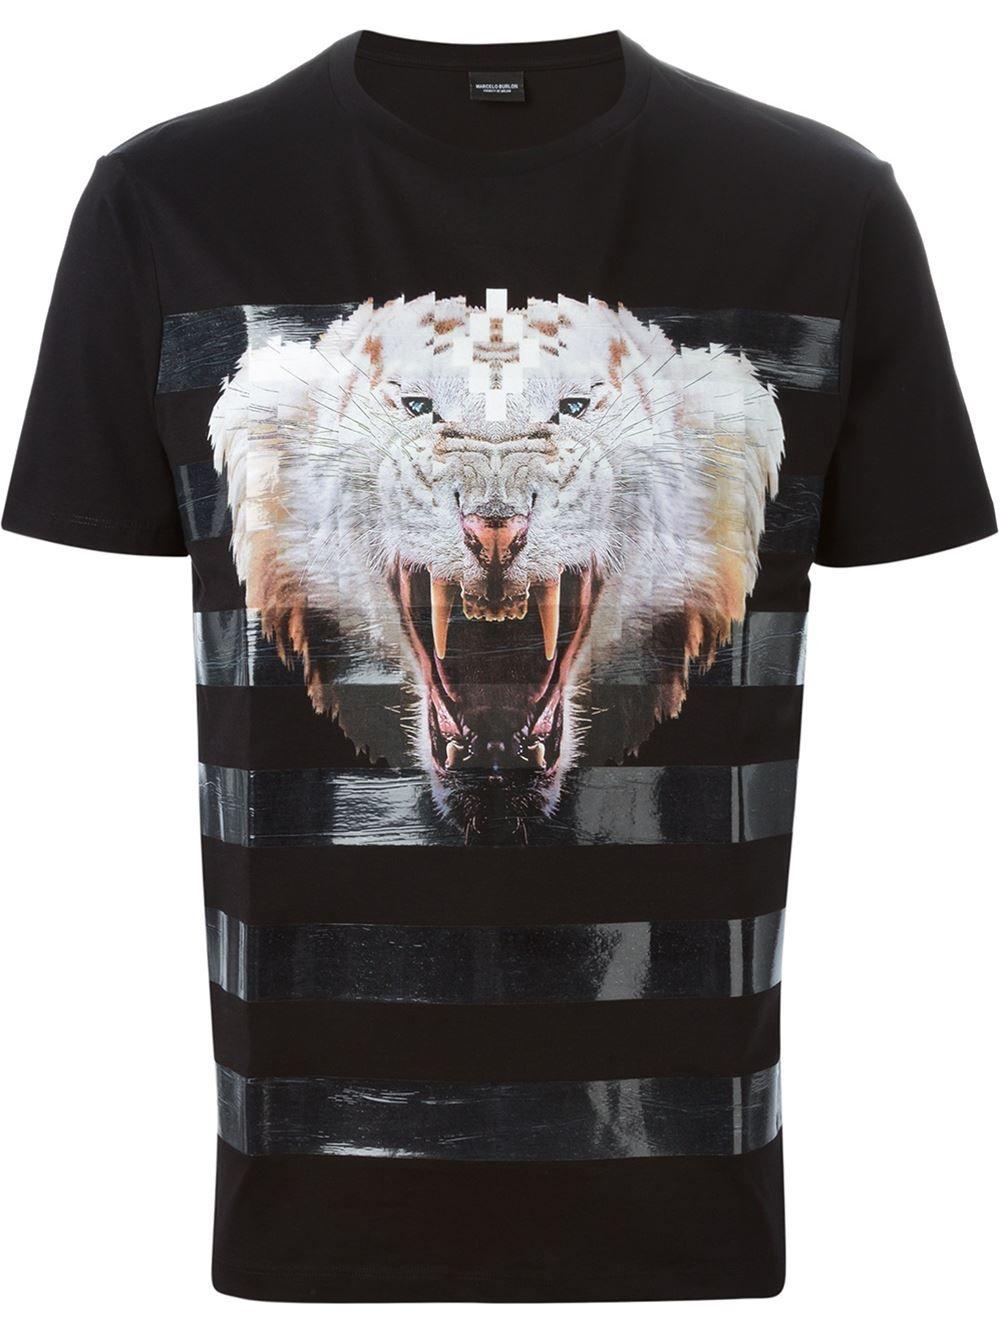 473516726fbc Marcelo Burlon County Of Milan Animal Print T-shirt - Mantovani -  Farfetch.com